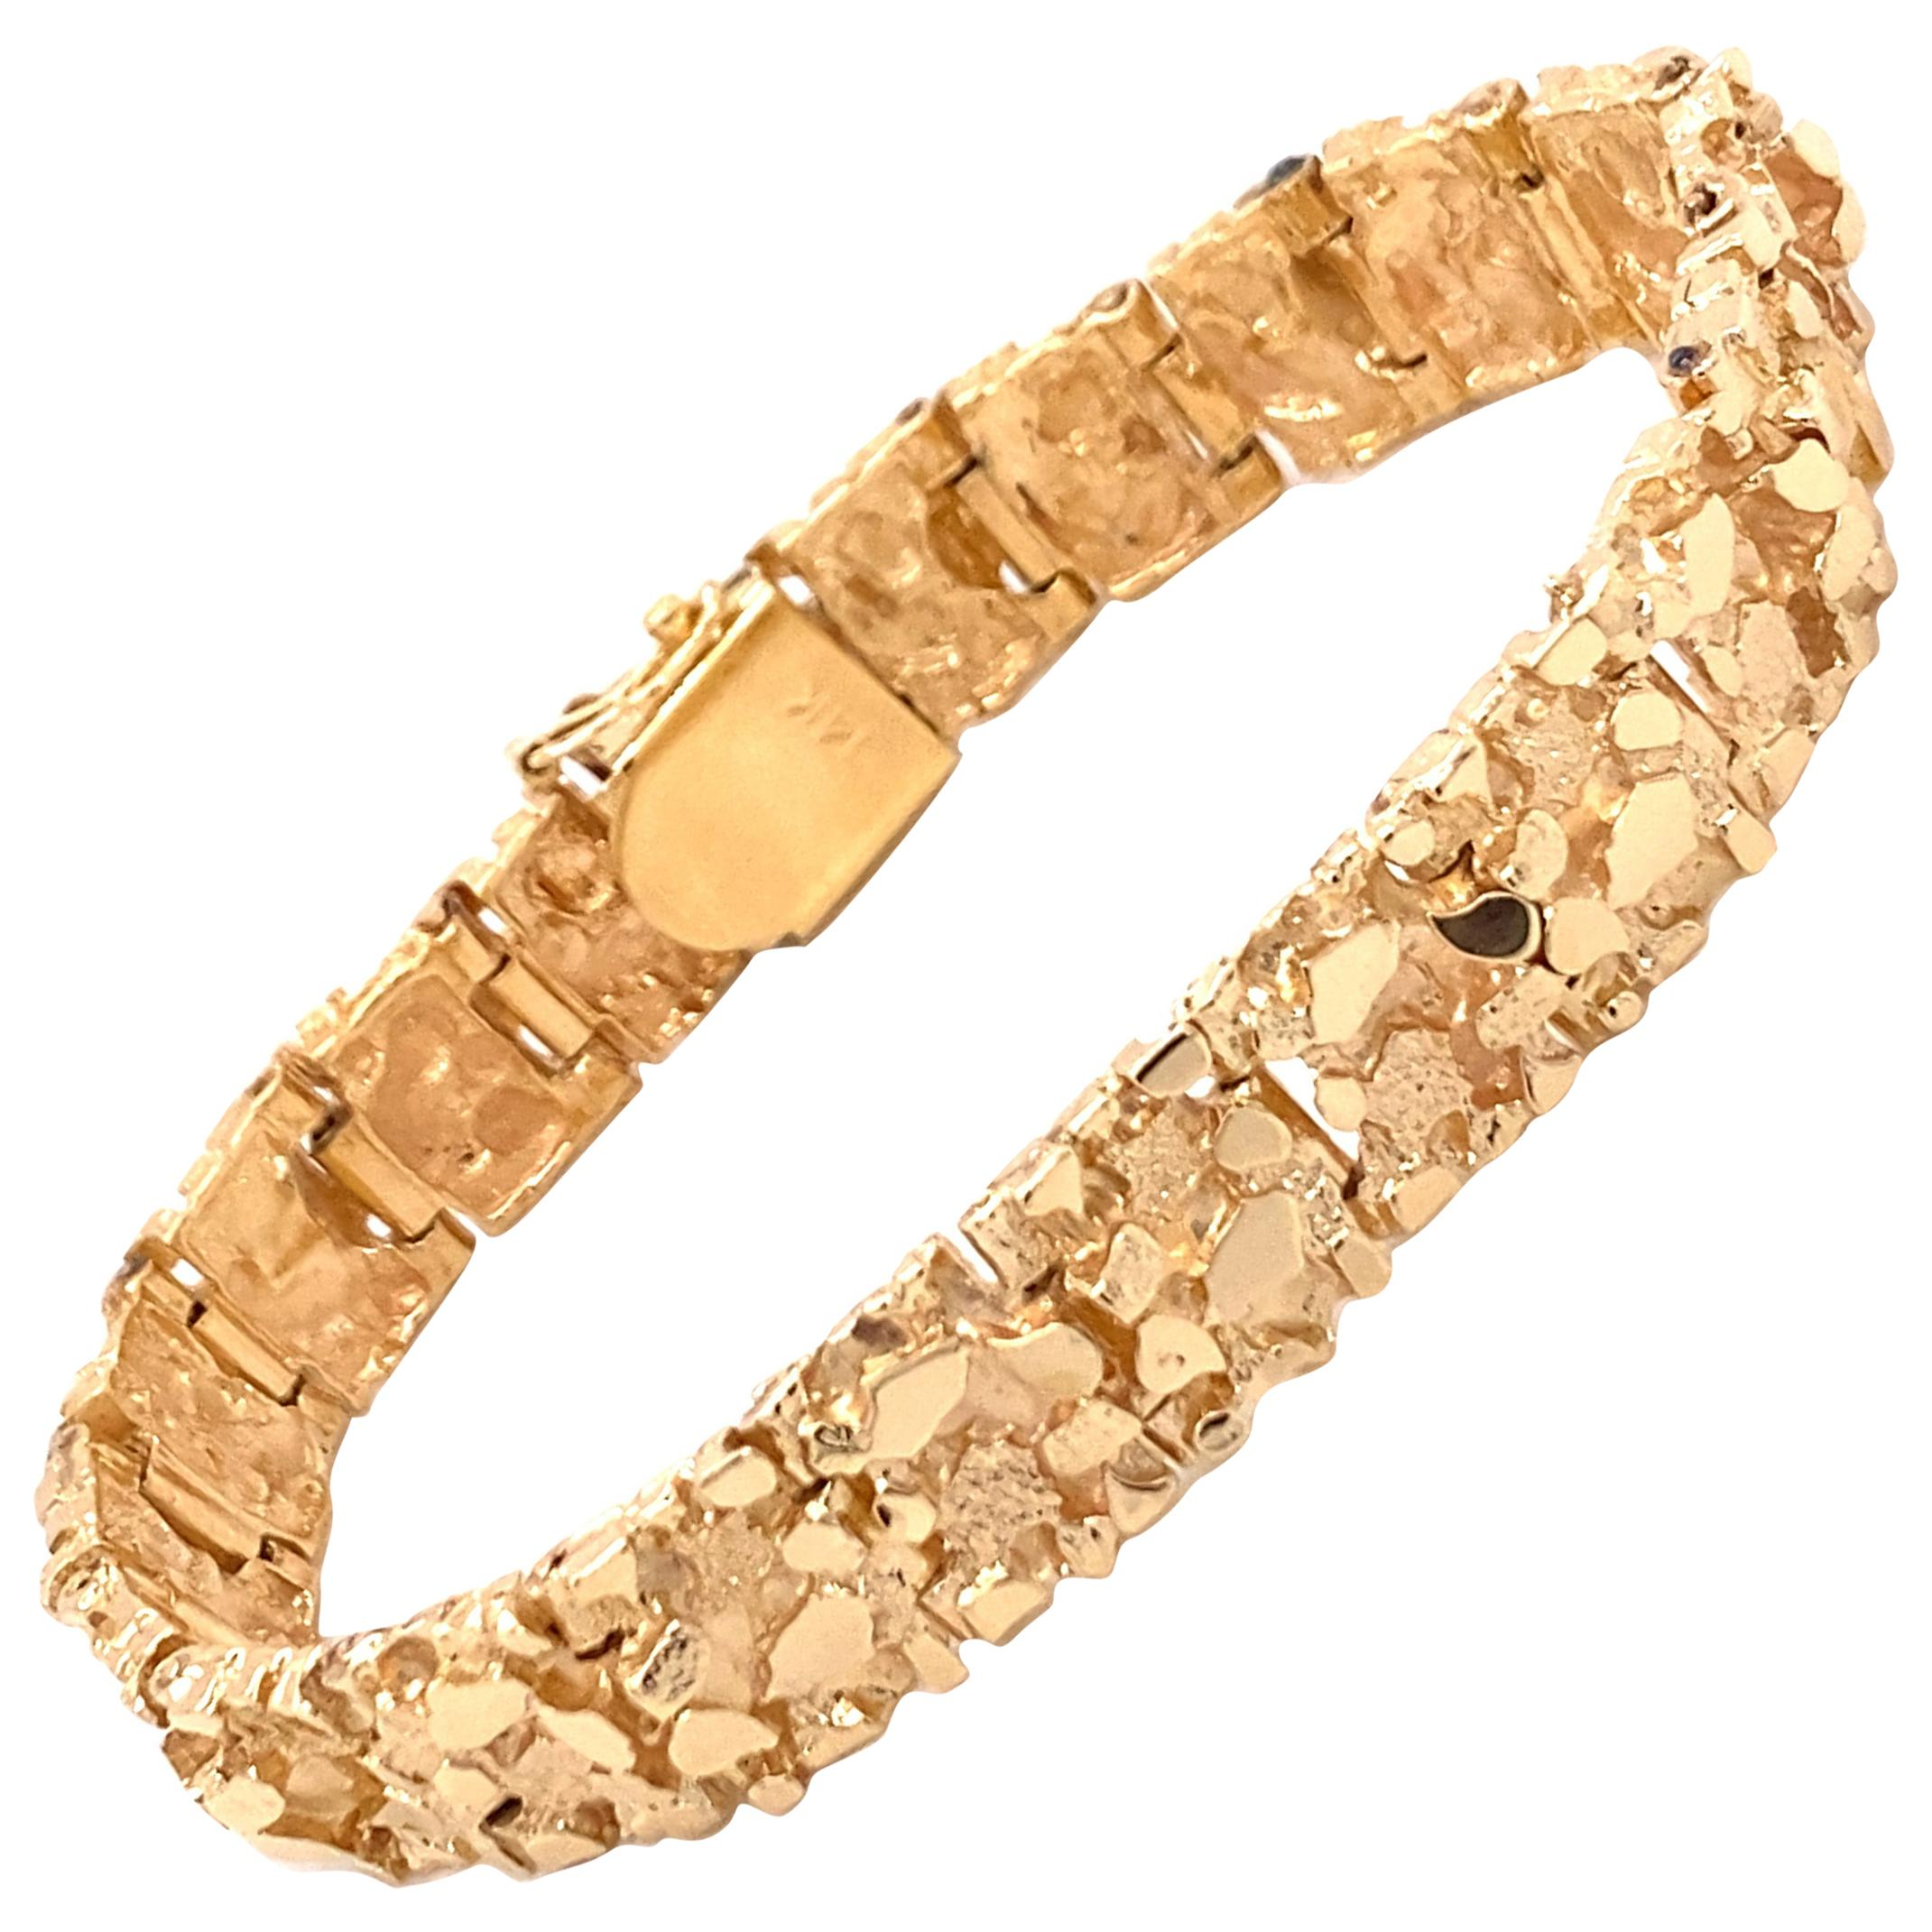 Vintage 1970's 14K Yellow Gold Nugget Bracelet